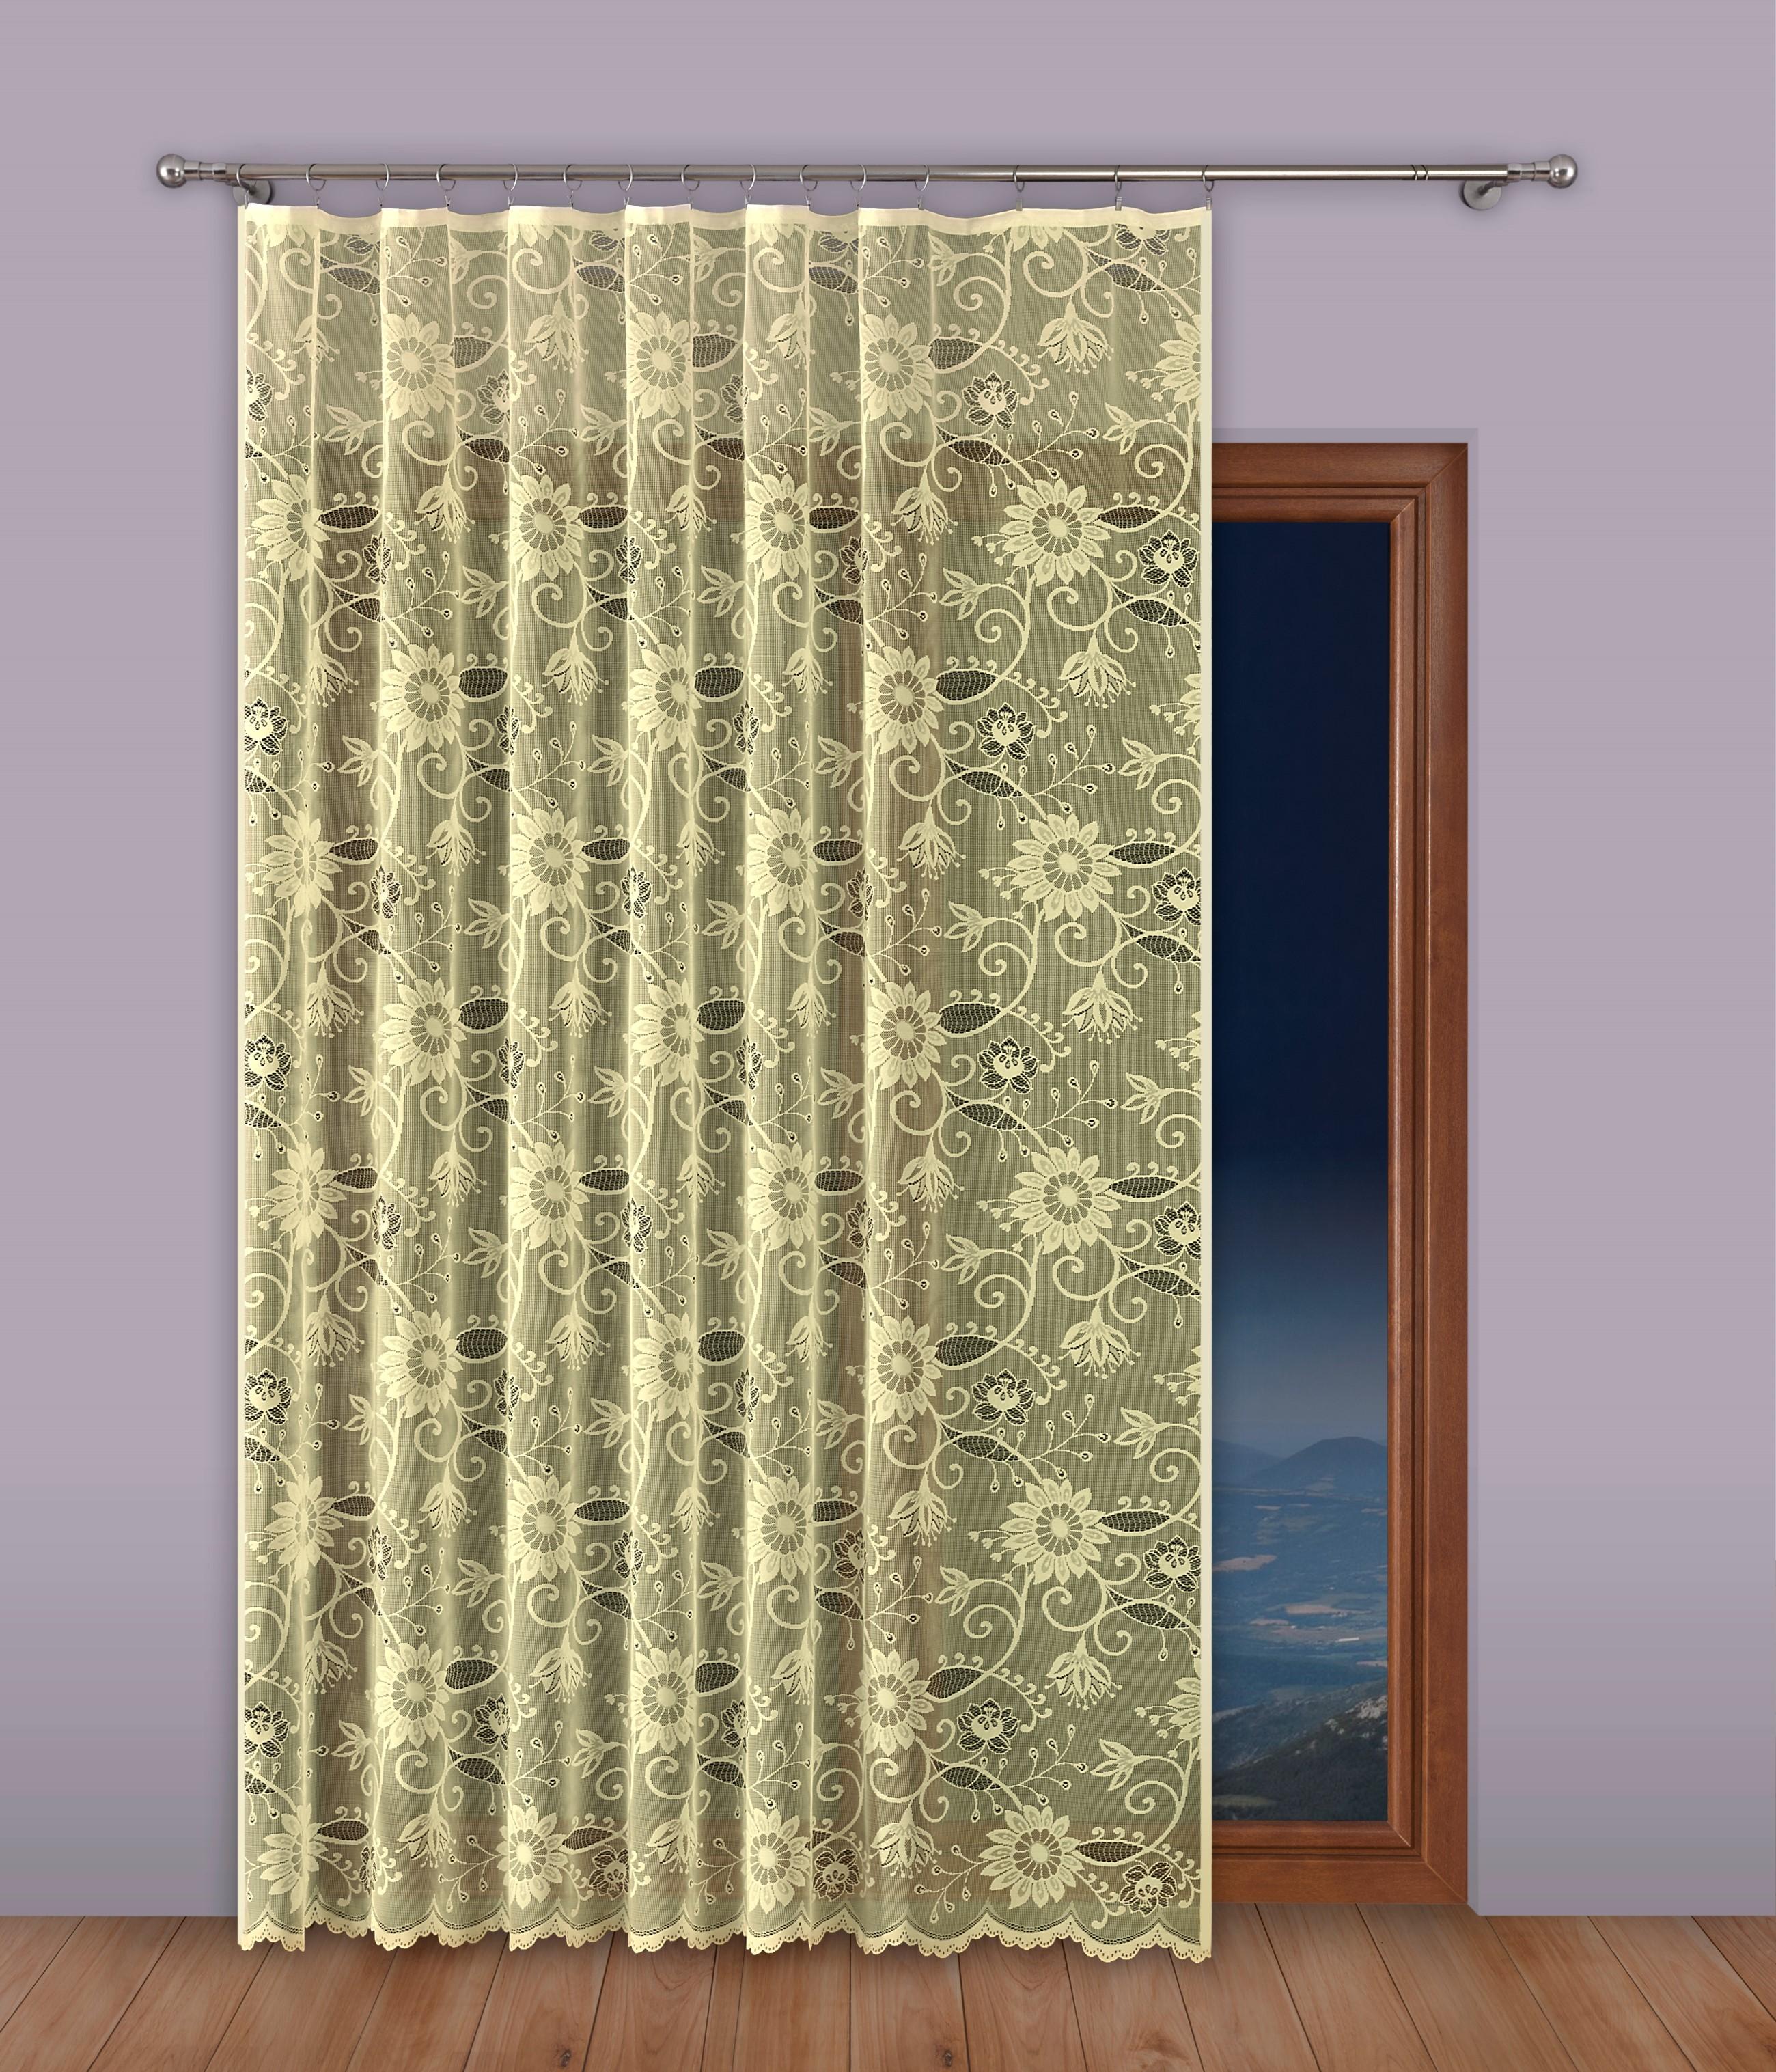 Шторы Primavera Классические шторы Beelzebub Цвет: Кремовый шторы primavera классические шторы luvinia цвет кремовый